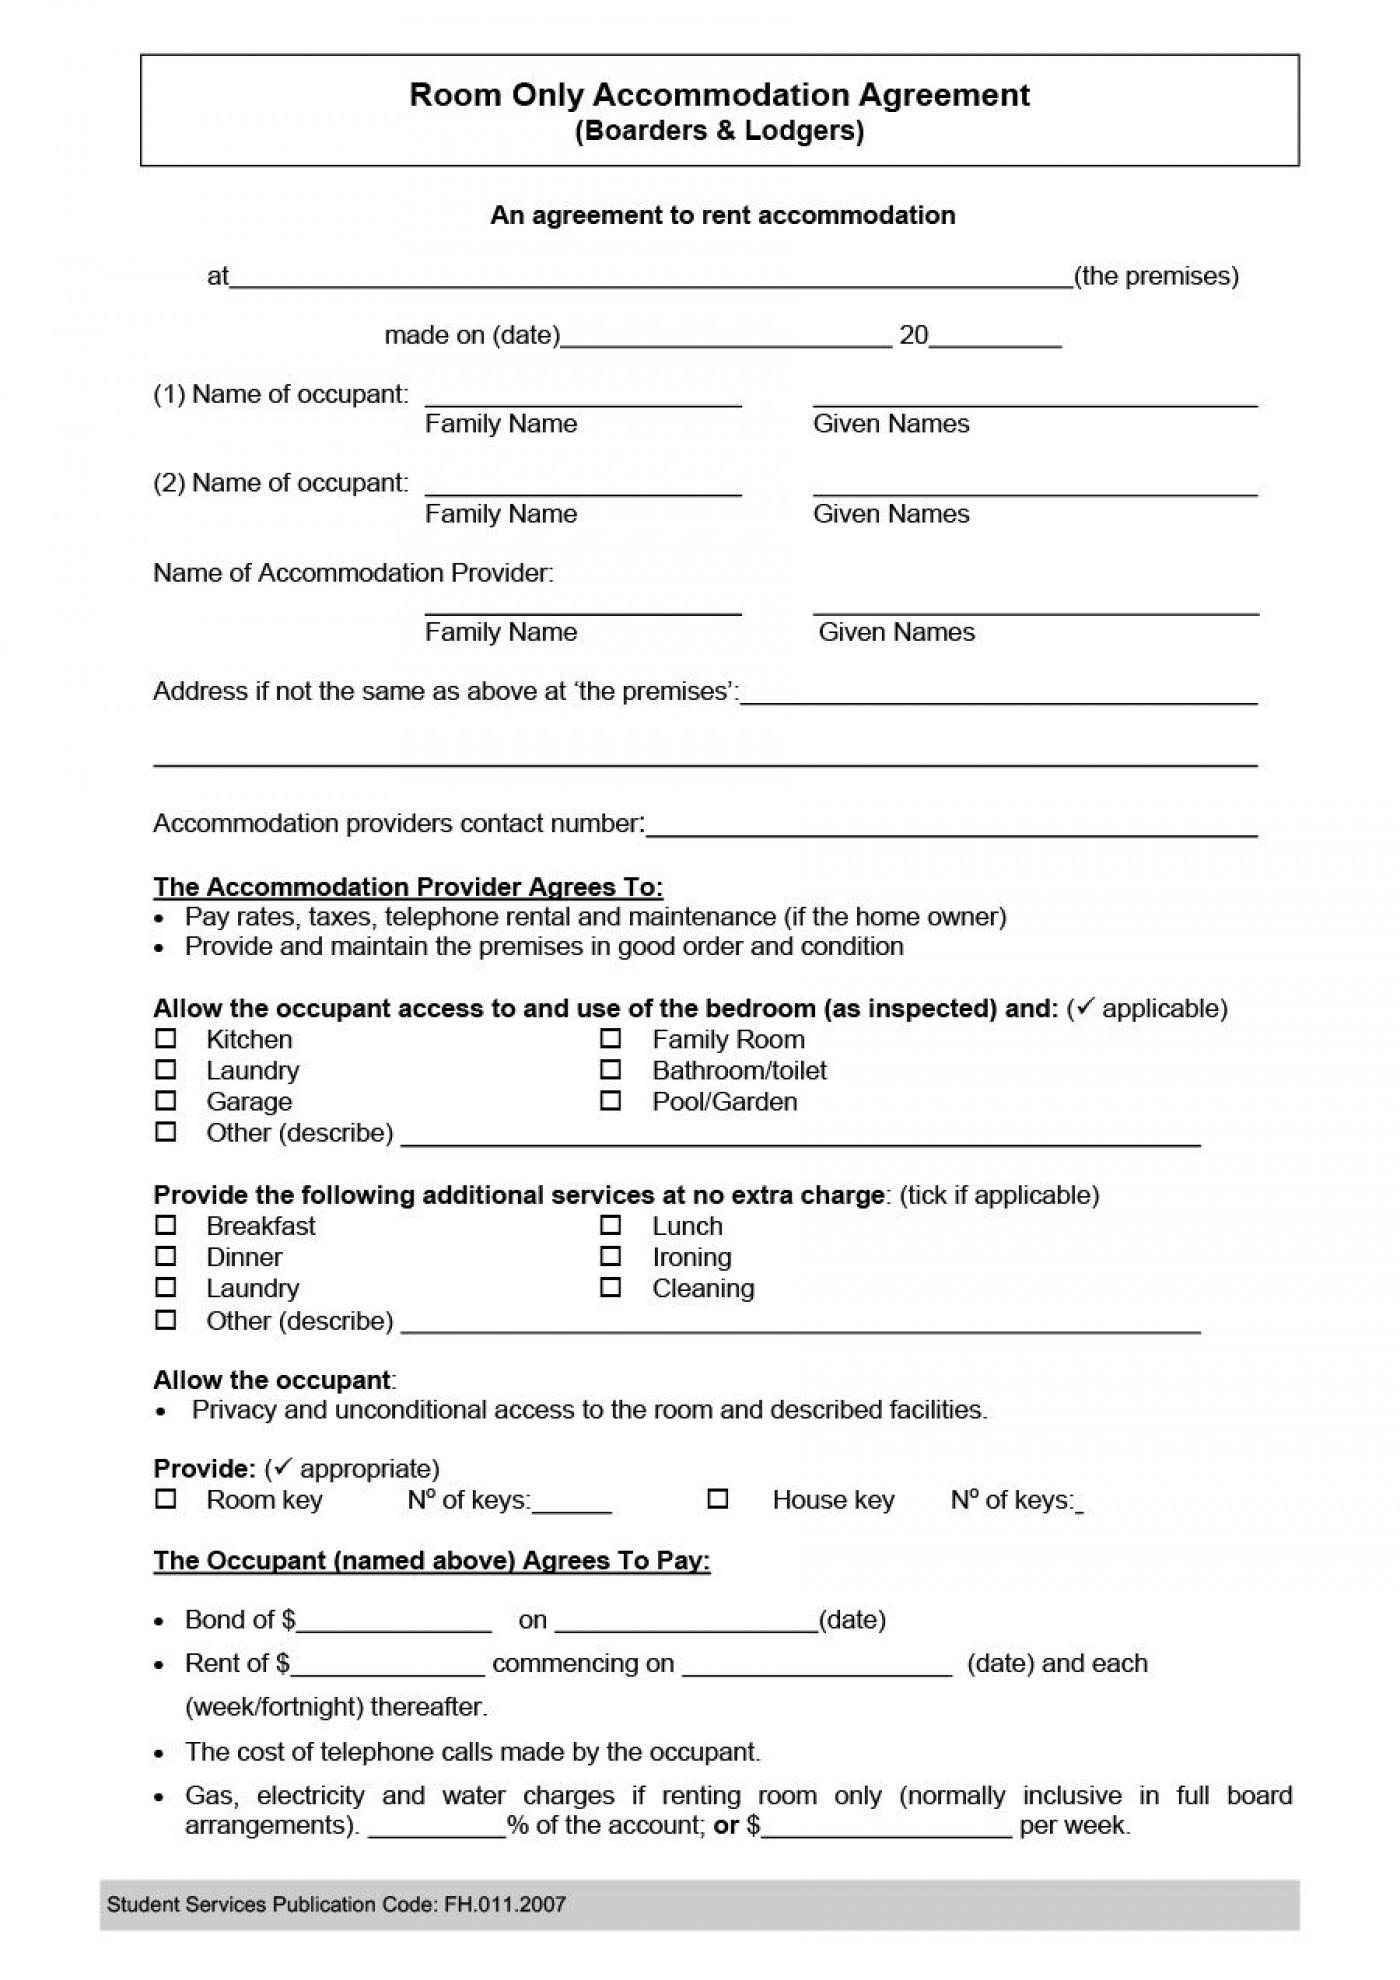 005 Incredible Generic Room Rental Agreement Free Idea  Printable1400